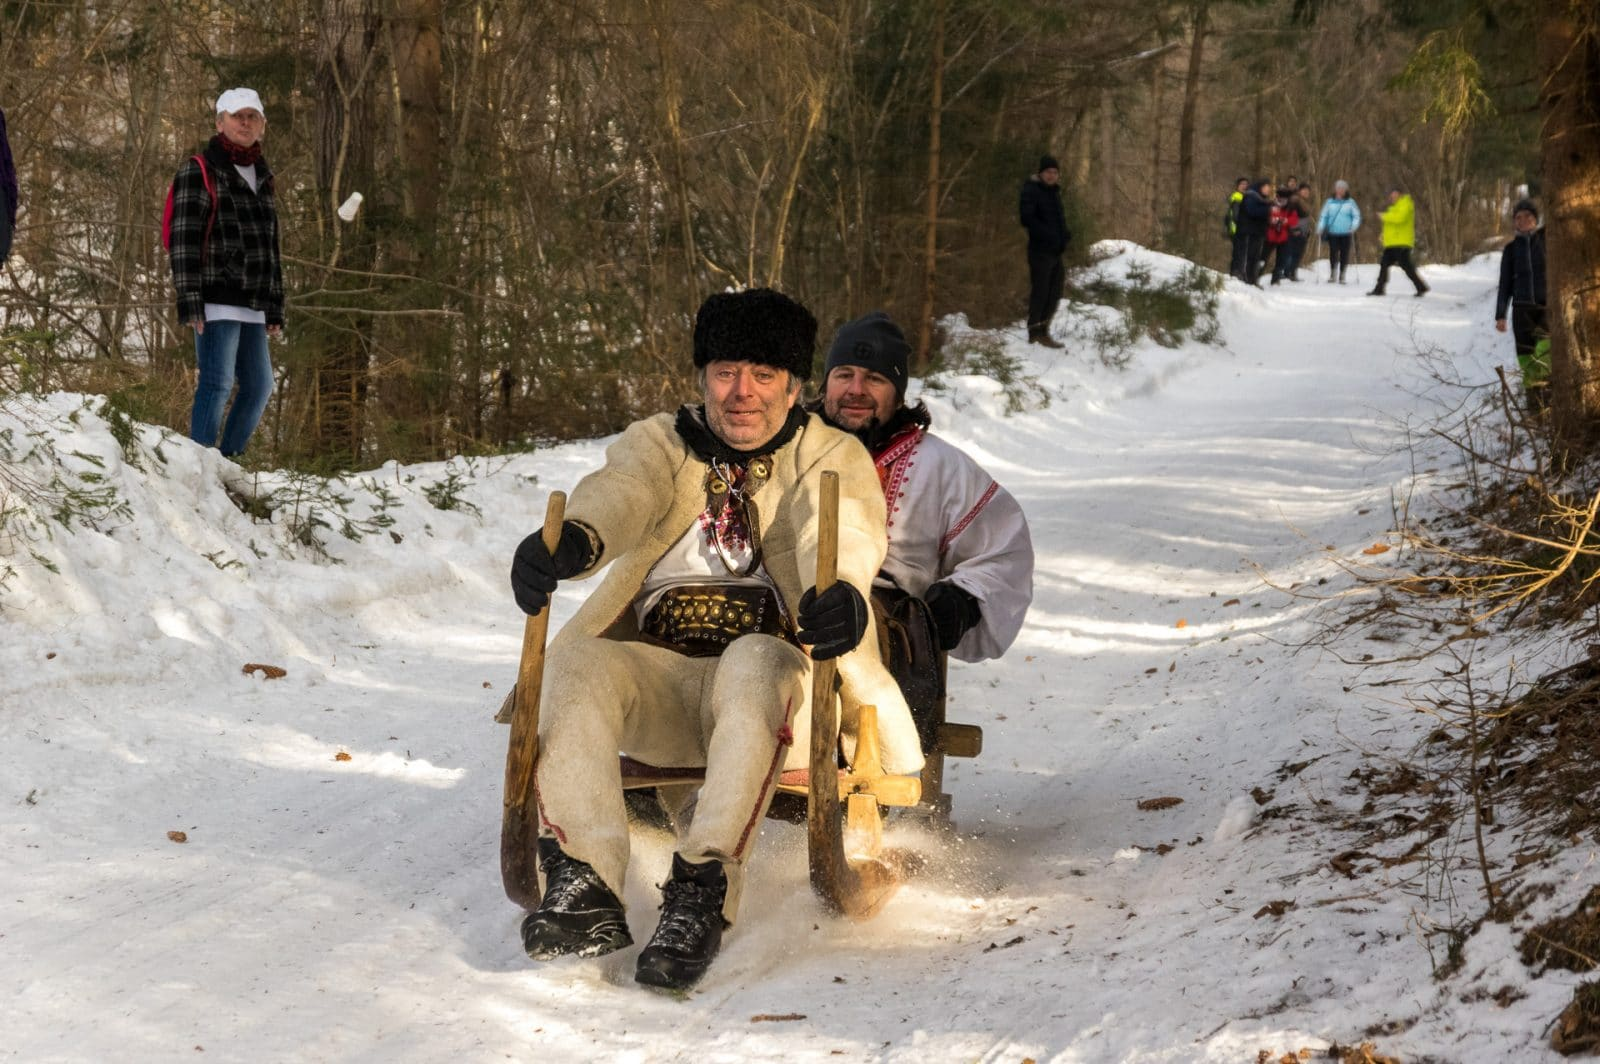 Krnohy : The Traditional Sledge Races of Slovakia